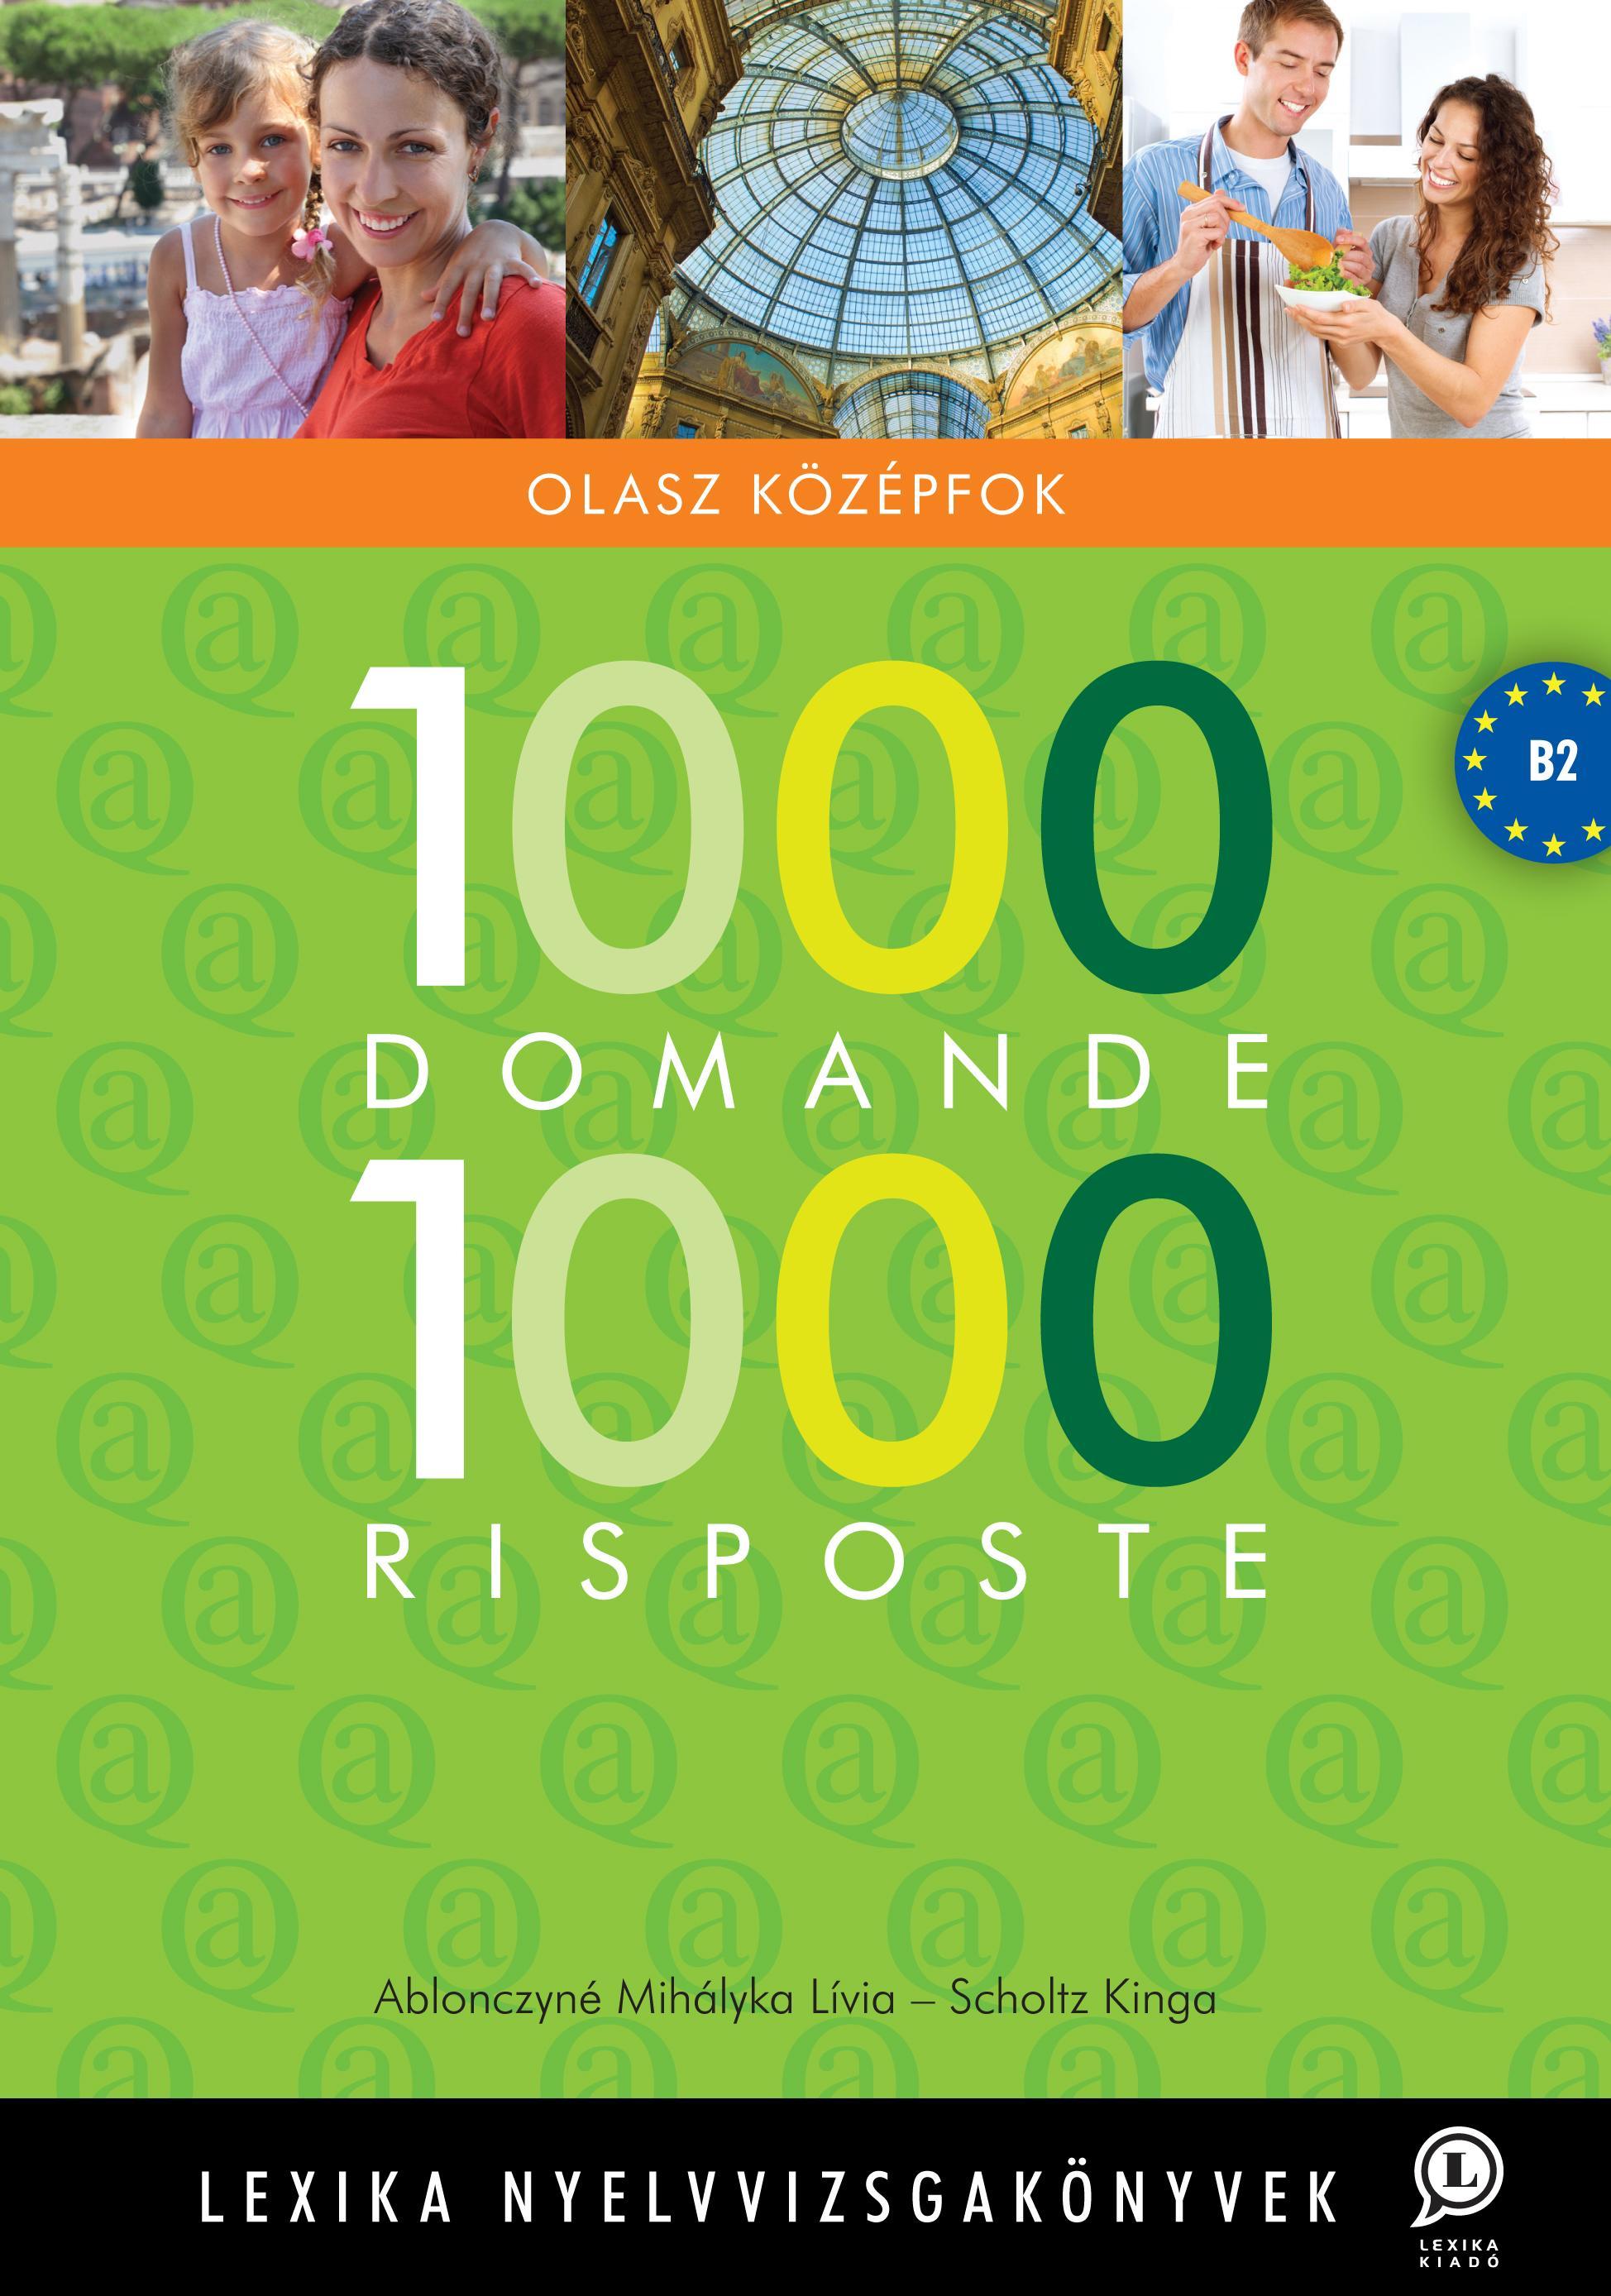 1000 DOMANDE 1000 RISPOSTE - OLASZ KÖZÉPFOK, B2